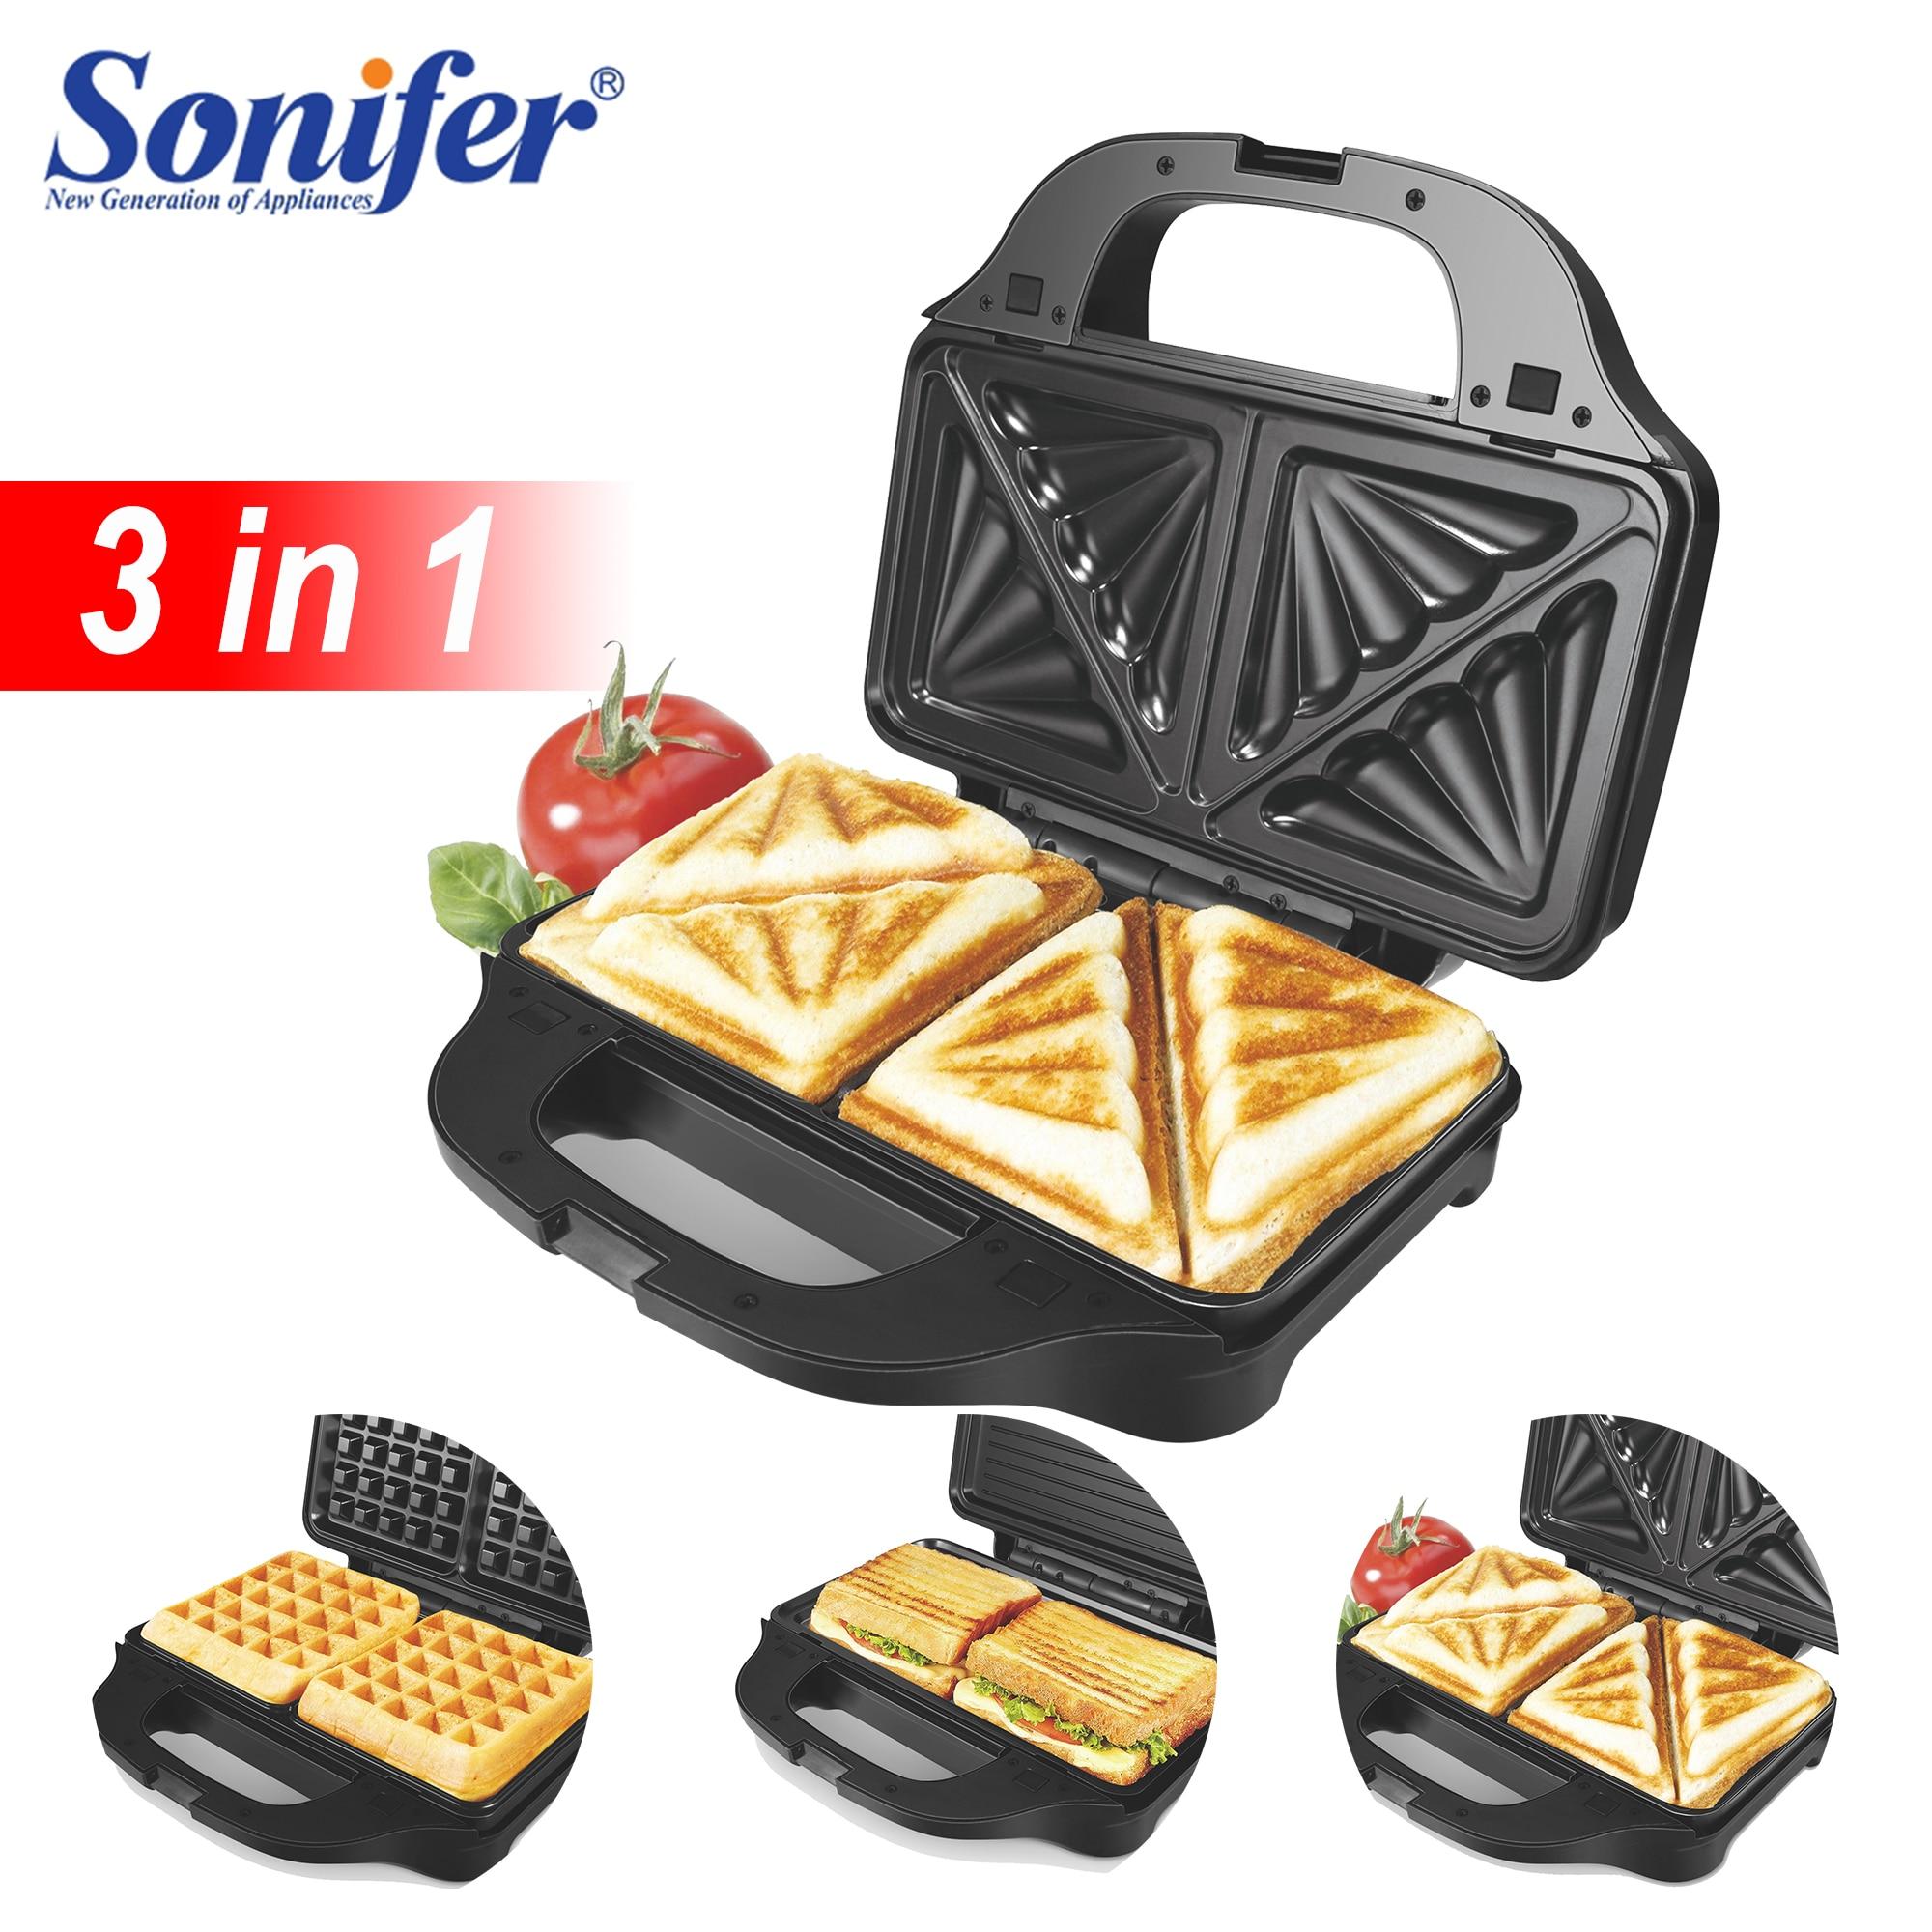 3 In 1 Electric Waffle Maker Iron Sandwich Machine Non-Stick Pan Bubble Egg Cake Oven Household Breakfast Waffle Machine Sonifer